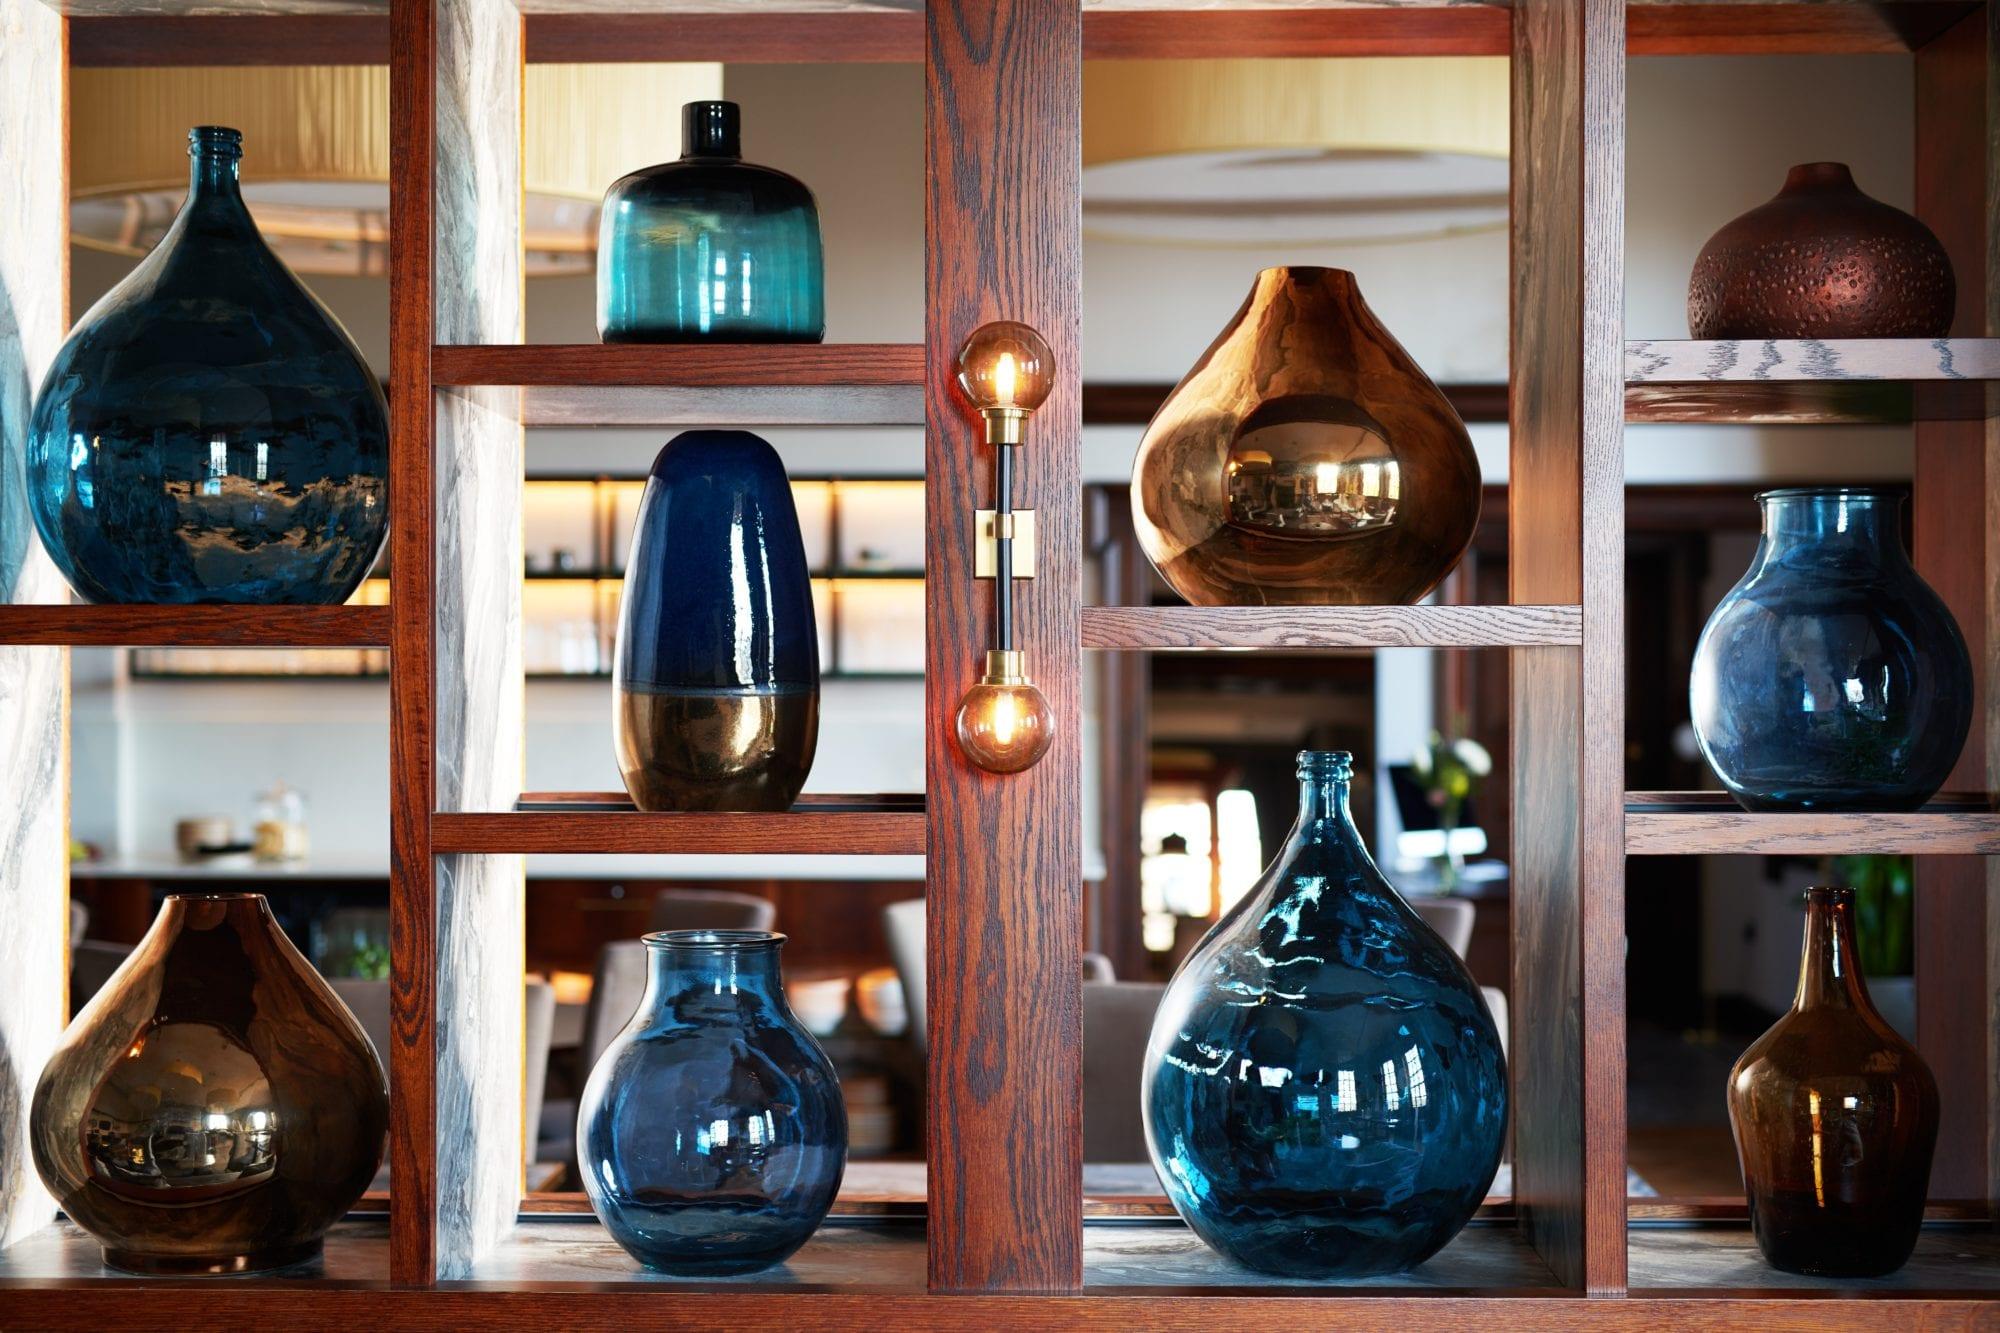 Detailed shot of vases in White Rose Lounge